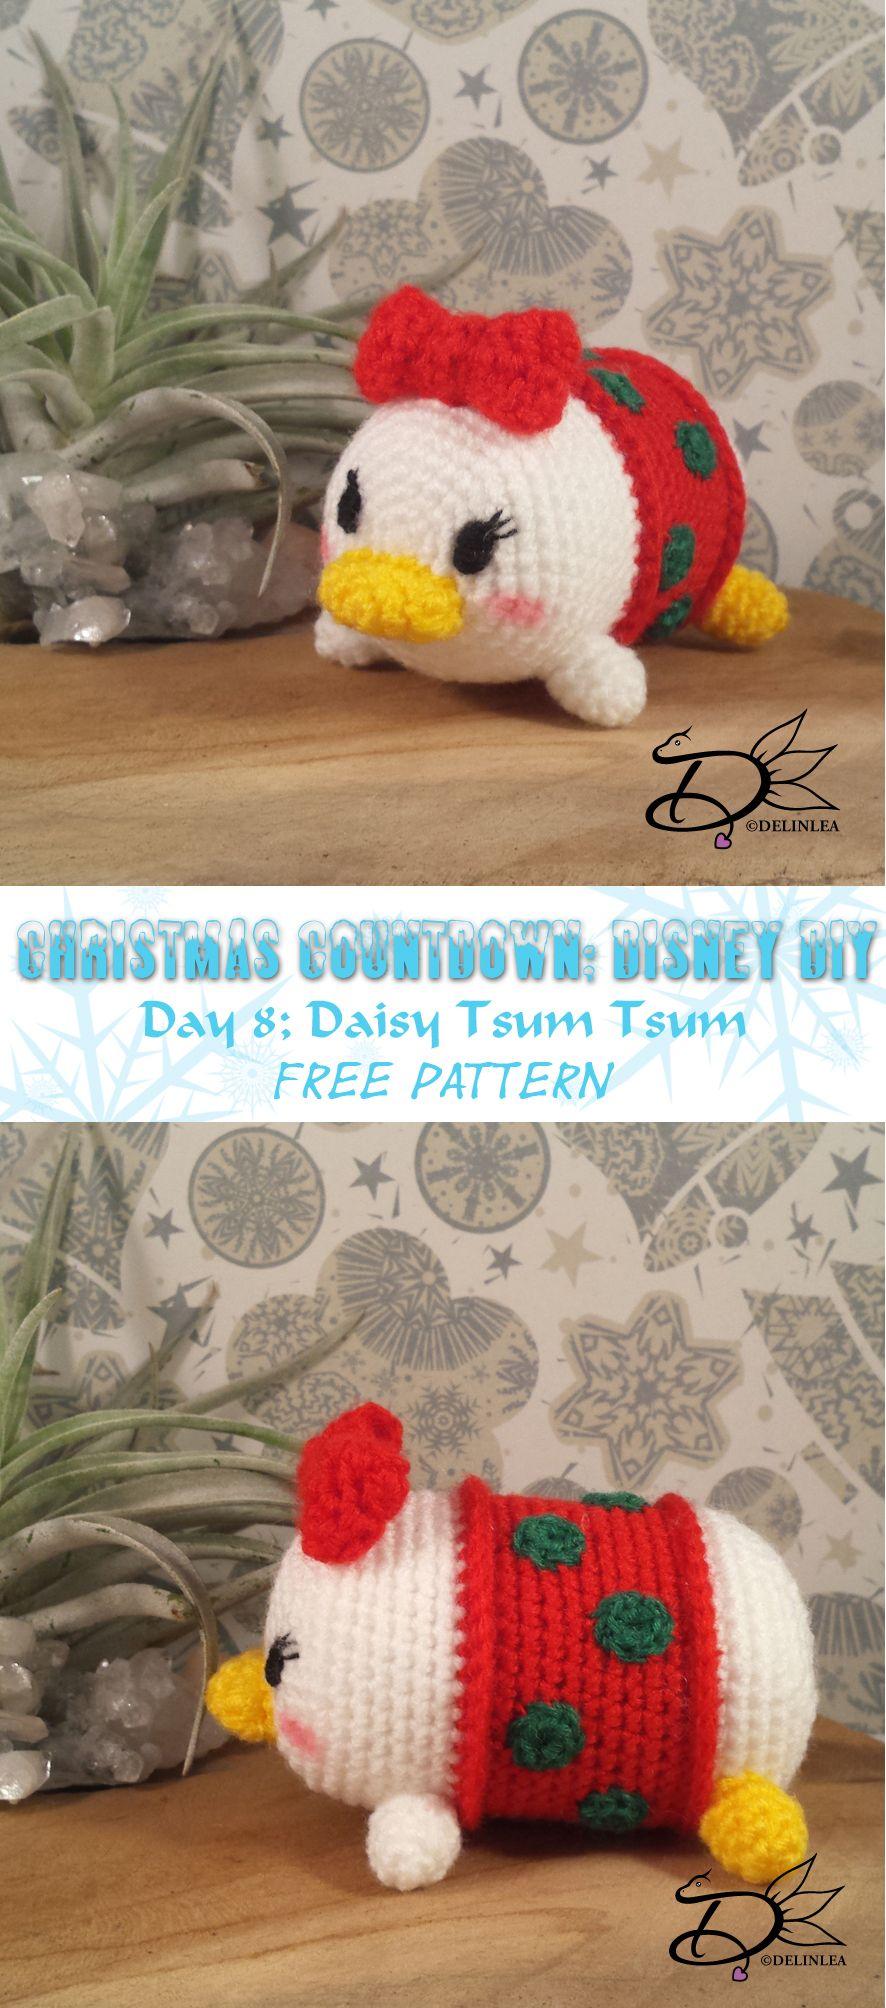 Daisy Tsum Tsum Amigurumi with Free Pattern | crochet | Pinterest ...